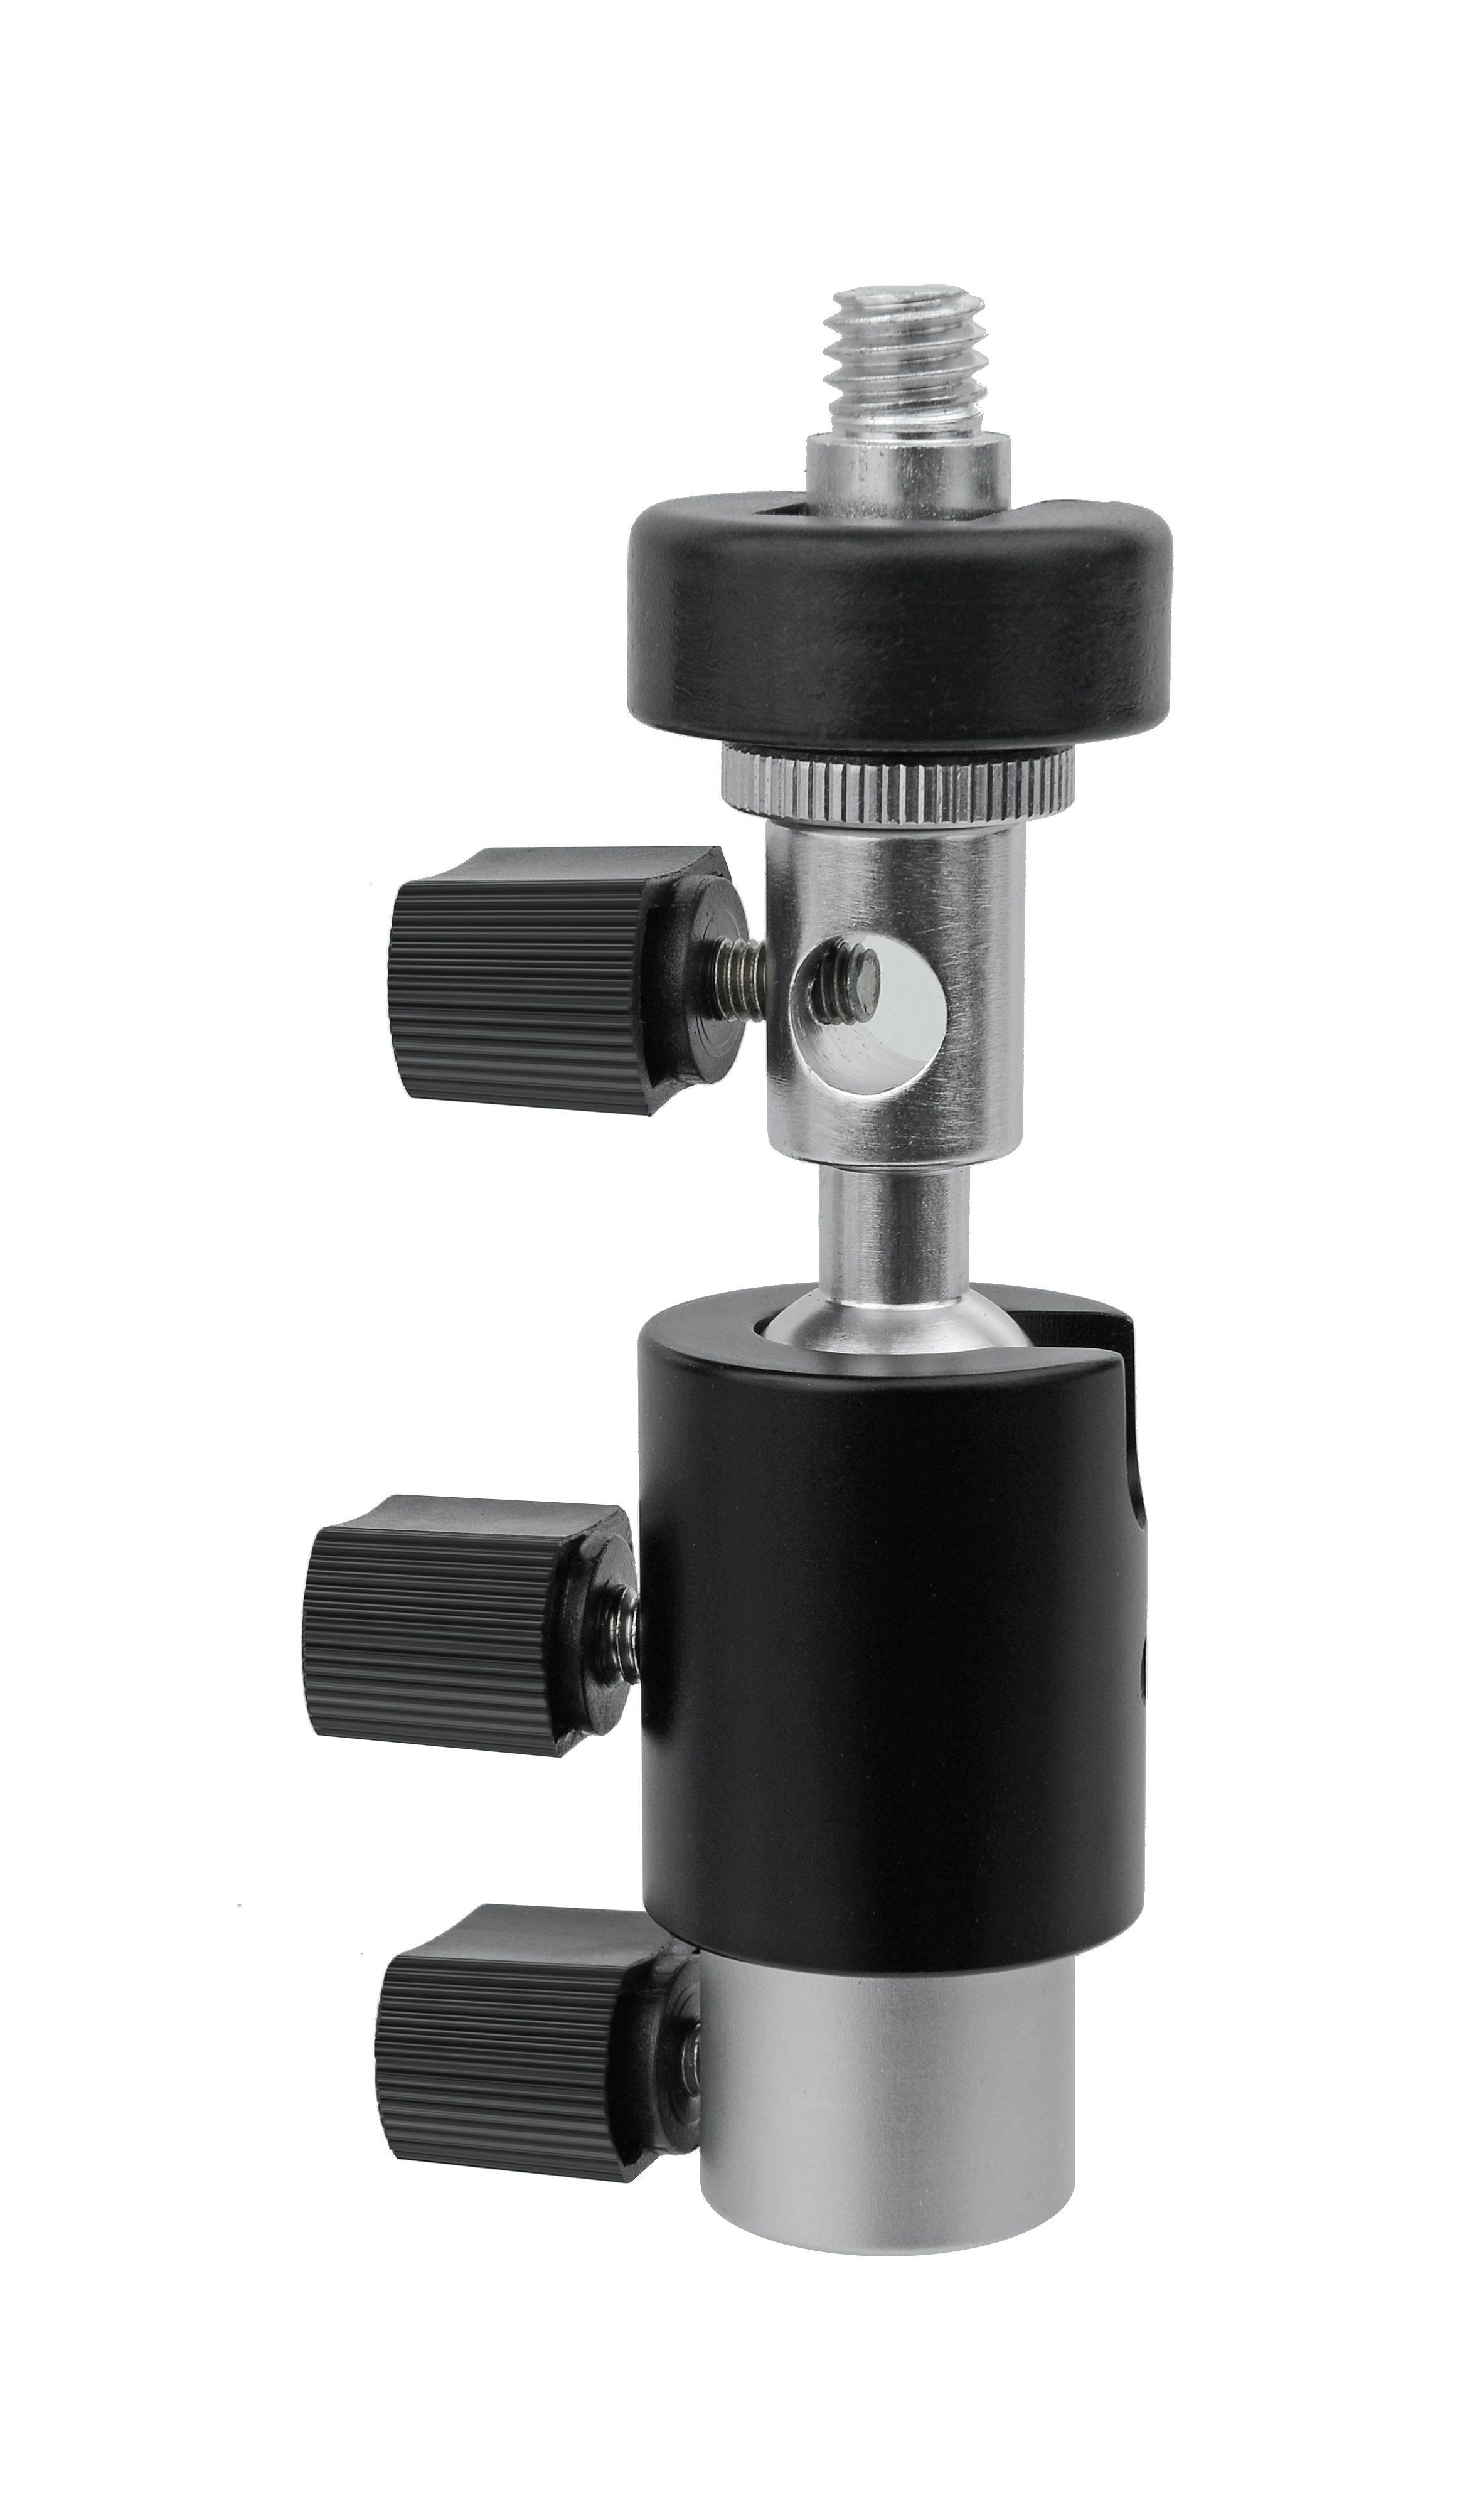 BRESSER Fotostudio »JM-26 variabler Zubehörhalter mit Kugelgelenk«